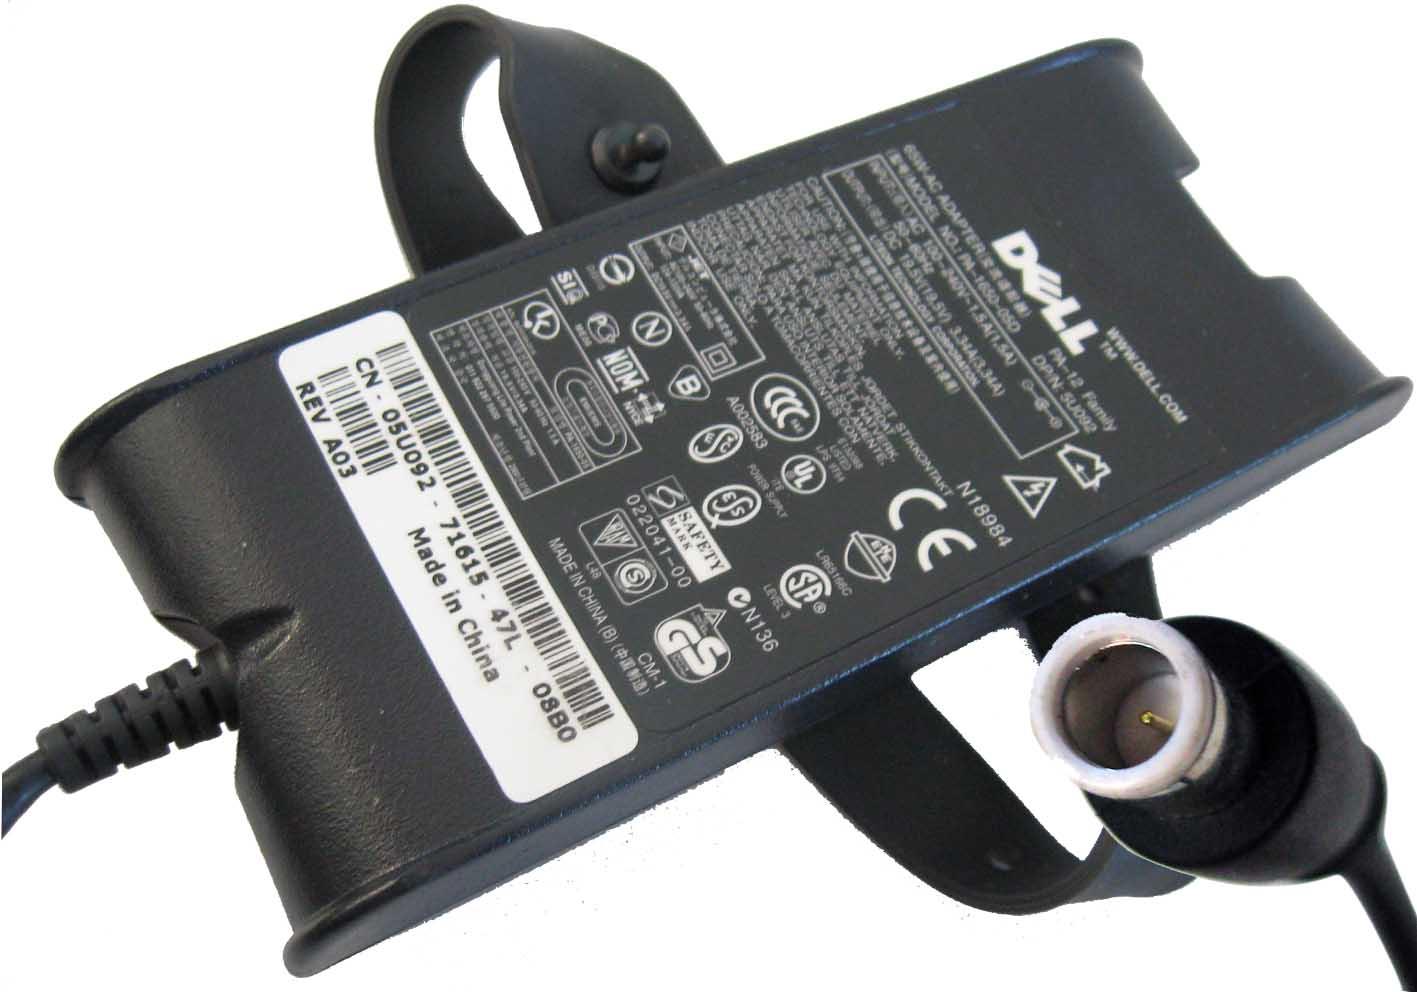 Adapter/ที่ชาร์จโน๊ตบุ๊ต /Dell 19.5V 3.34A 65W /ของแท้ประกันศูนย์ Dell on-Site Service